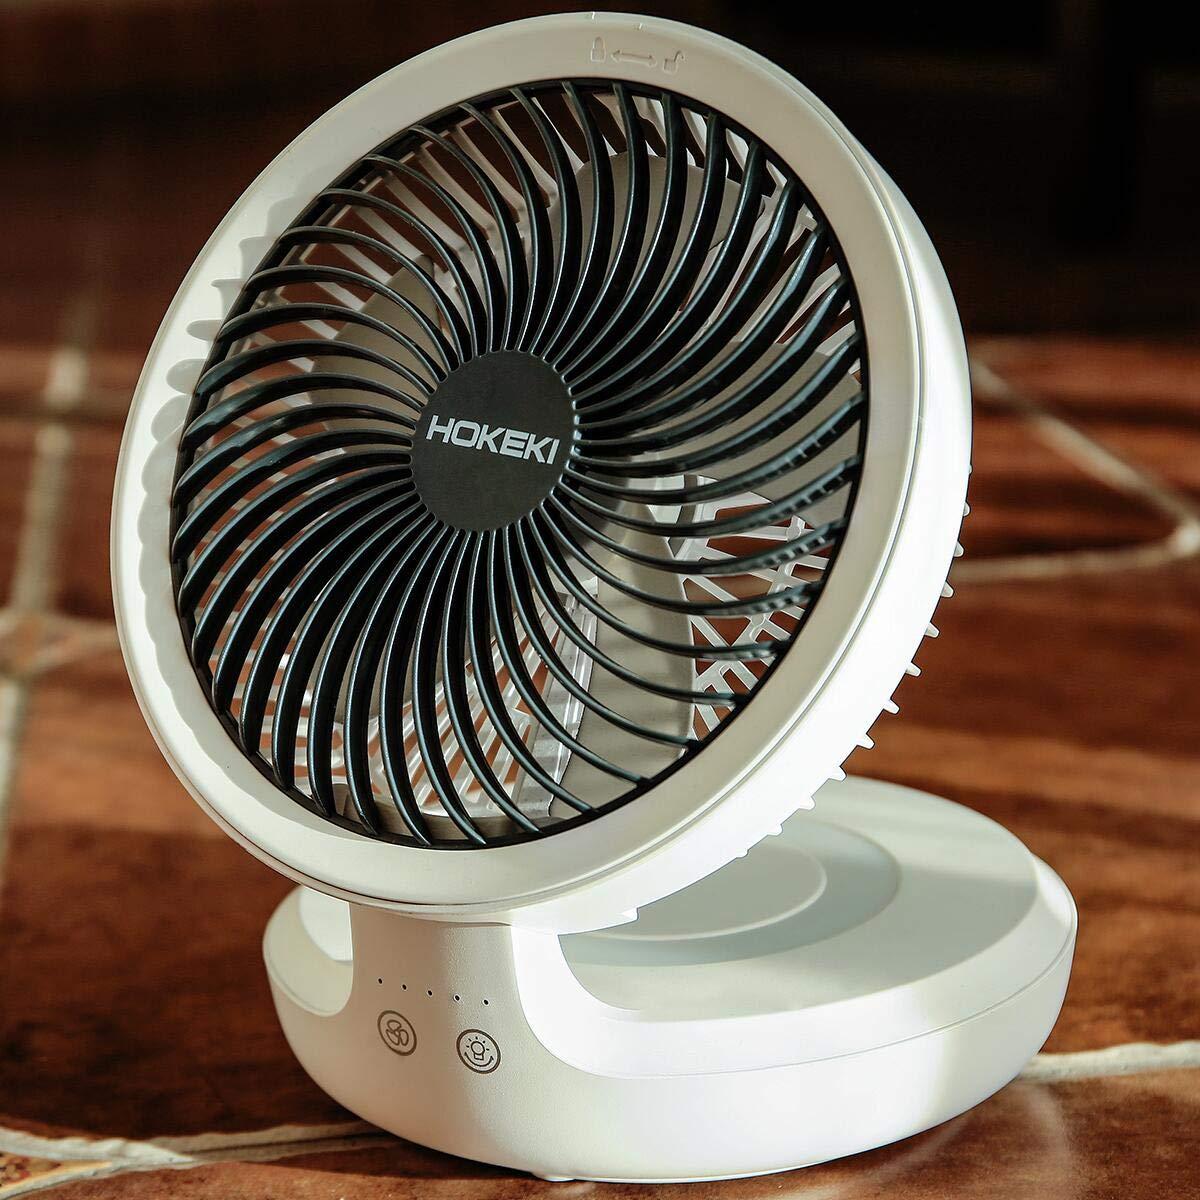 HOKEKI USB Desk Fan with Night Breathing Light, Air Circulator Desk Fan 90 Degree Rotation Portable Foldable Fan for Home, Office, Travel, Camping, Outdoor, Indoor Fan, 4 Speed Setting, White by HOKEKI